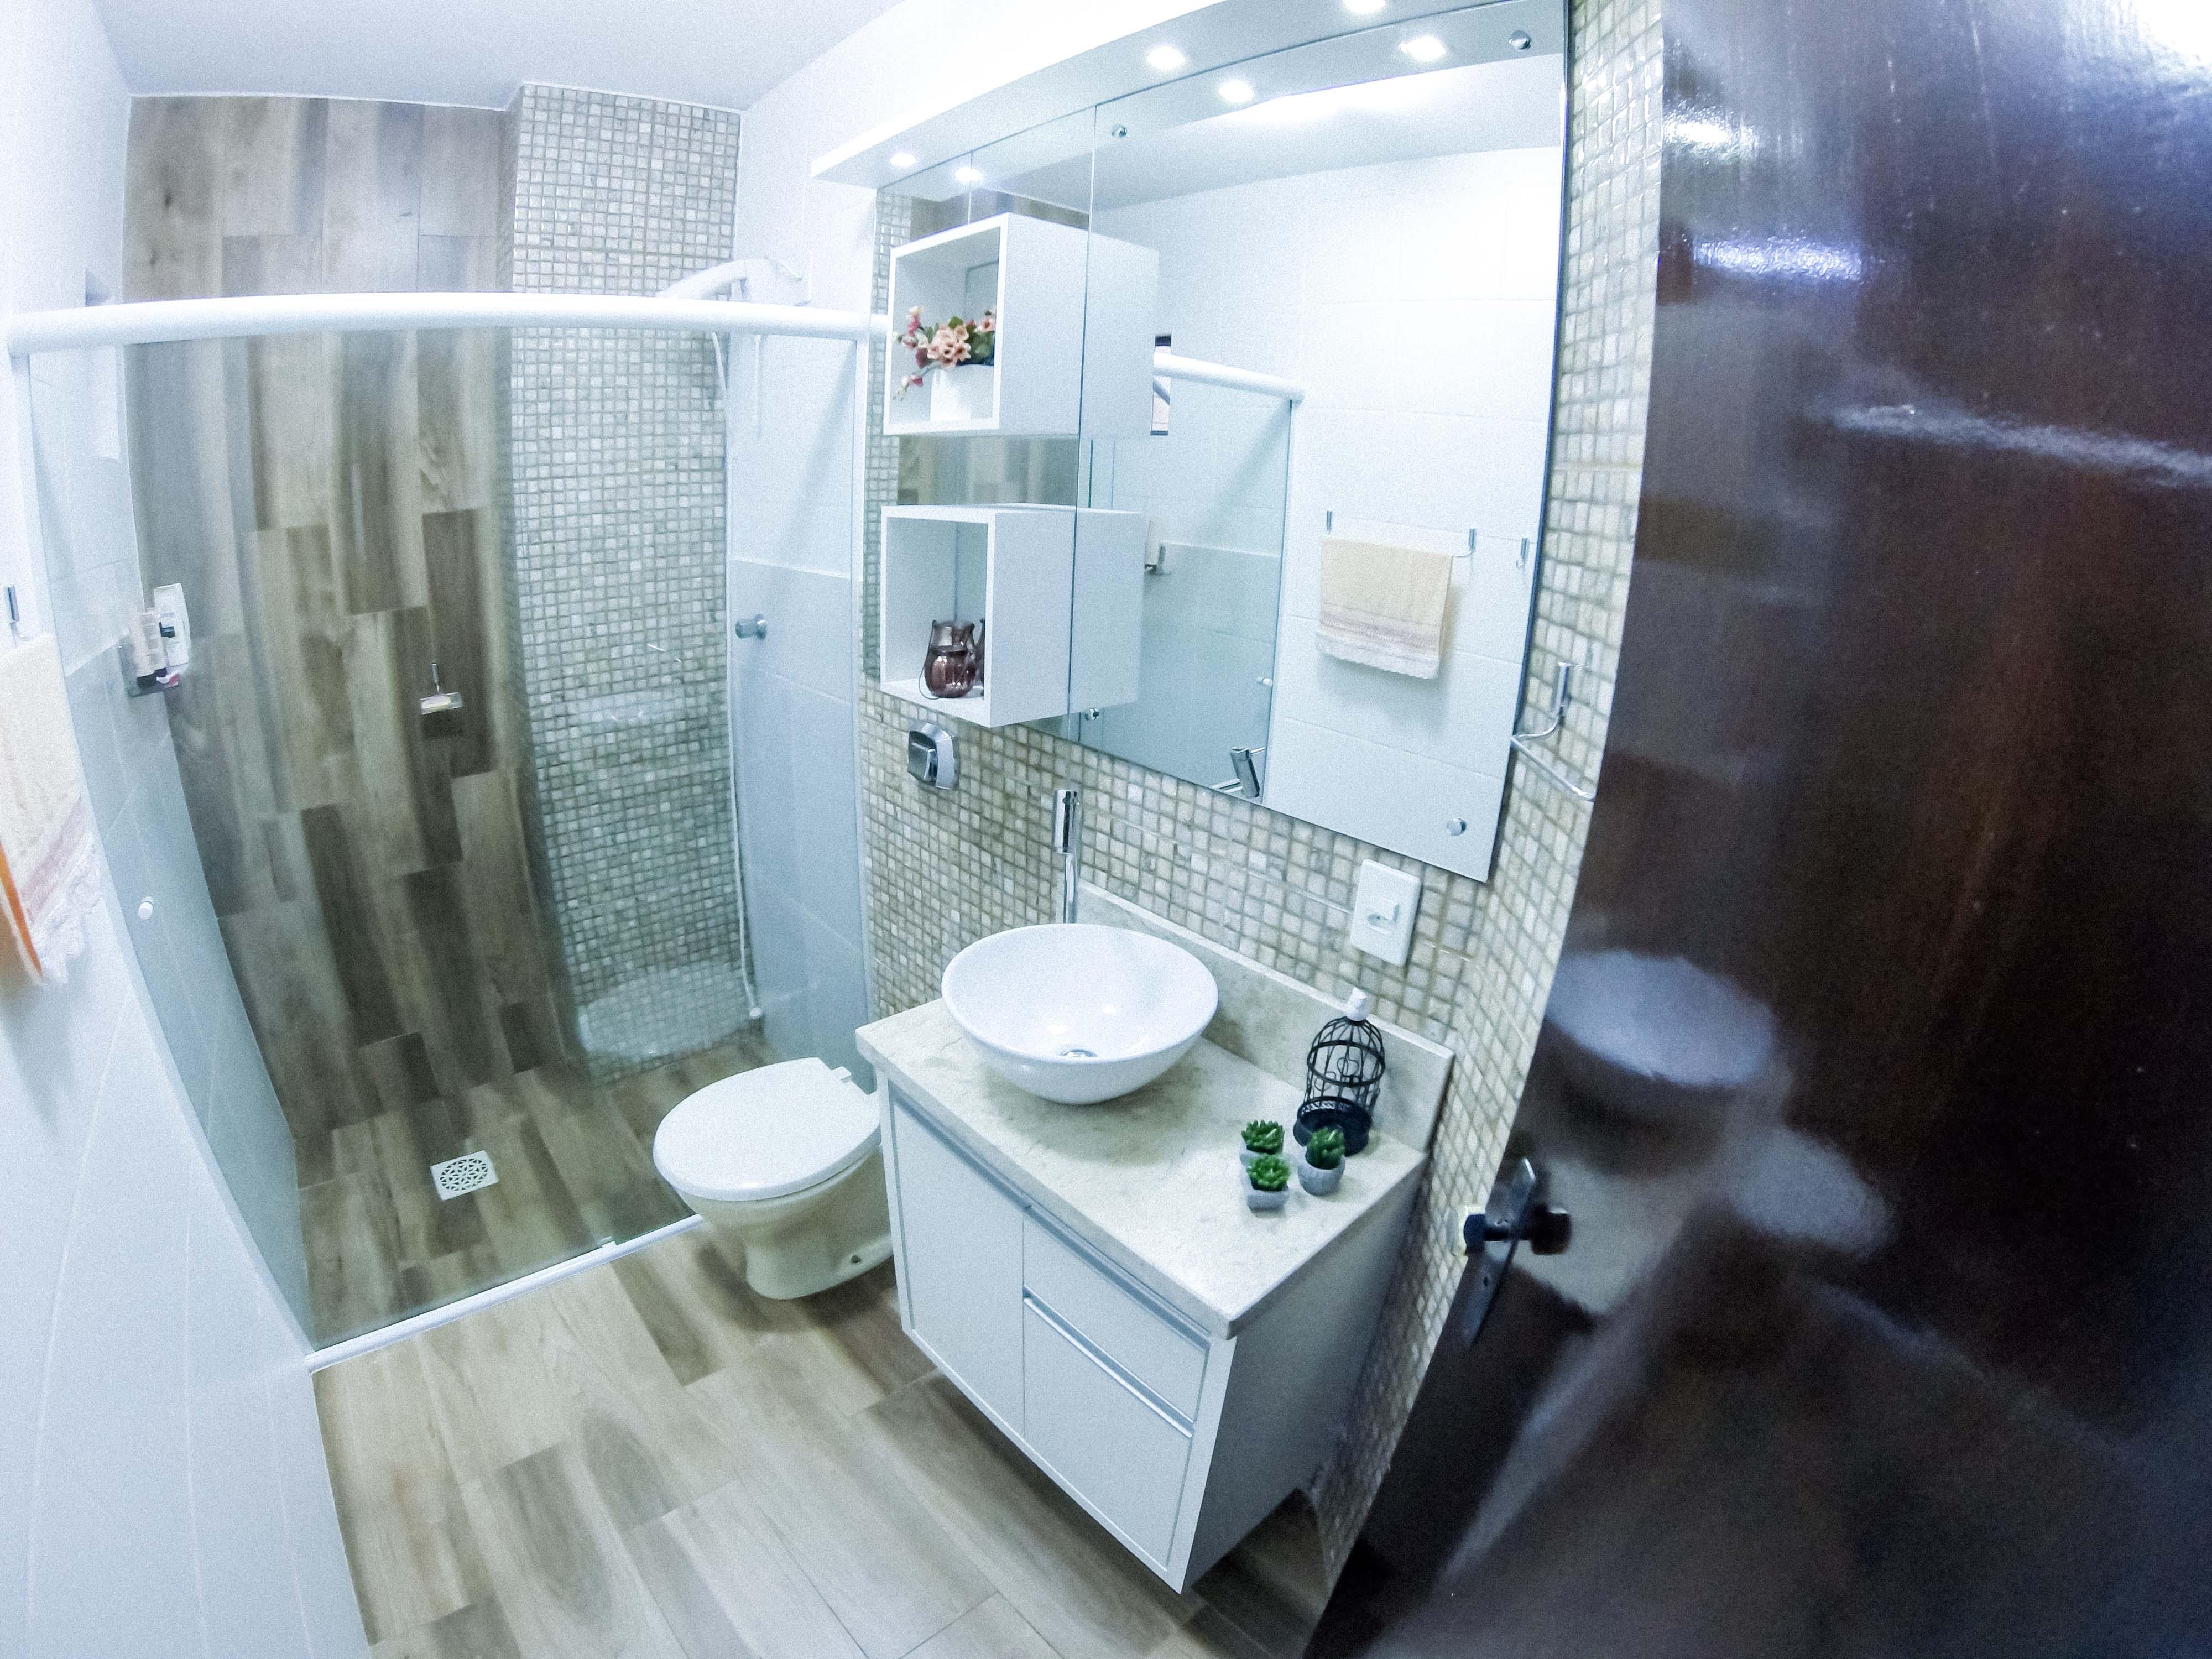 Banheiros Sob Medida Banheiros Planejados em Blumenau.jpg #496882 4000 3000